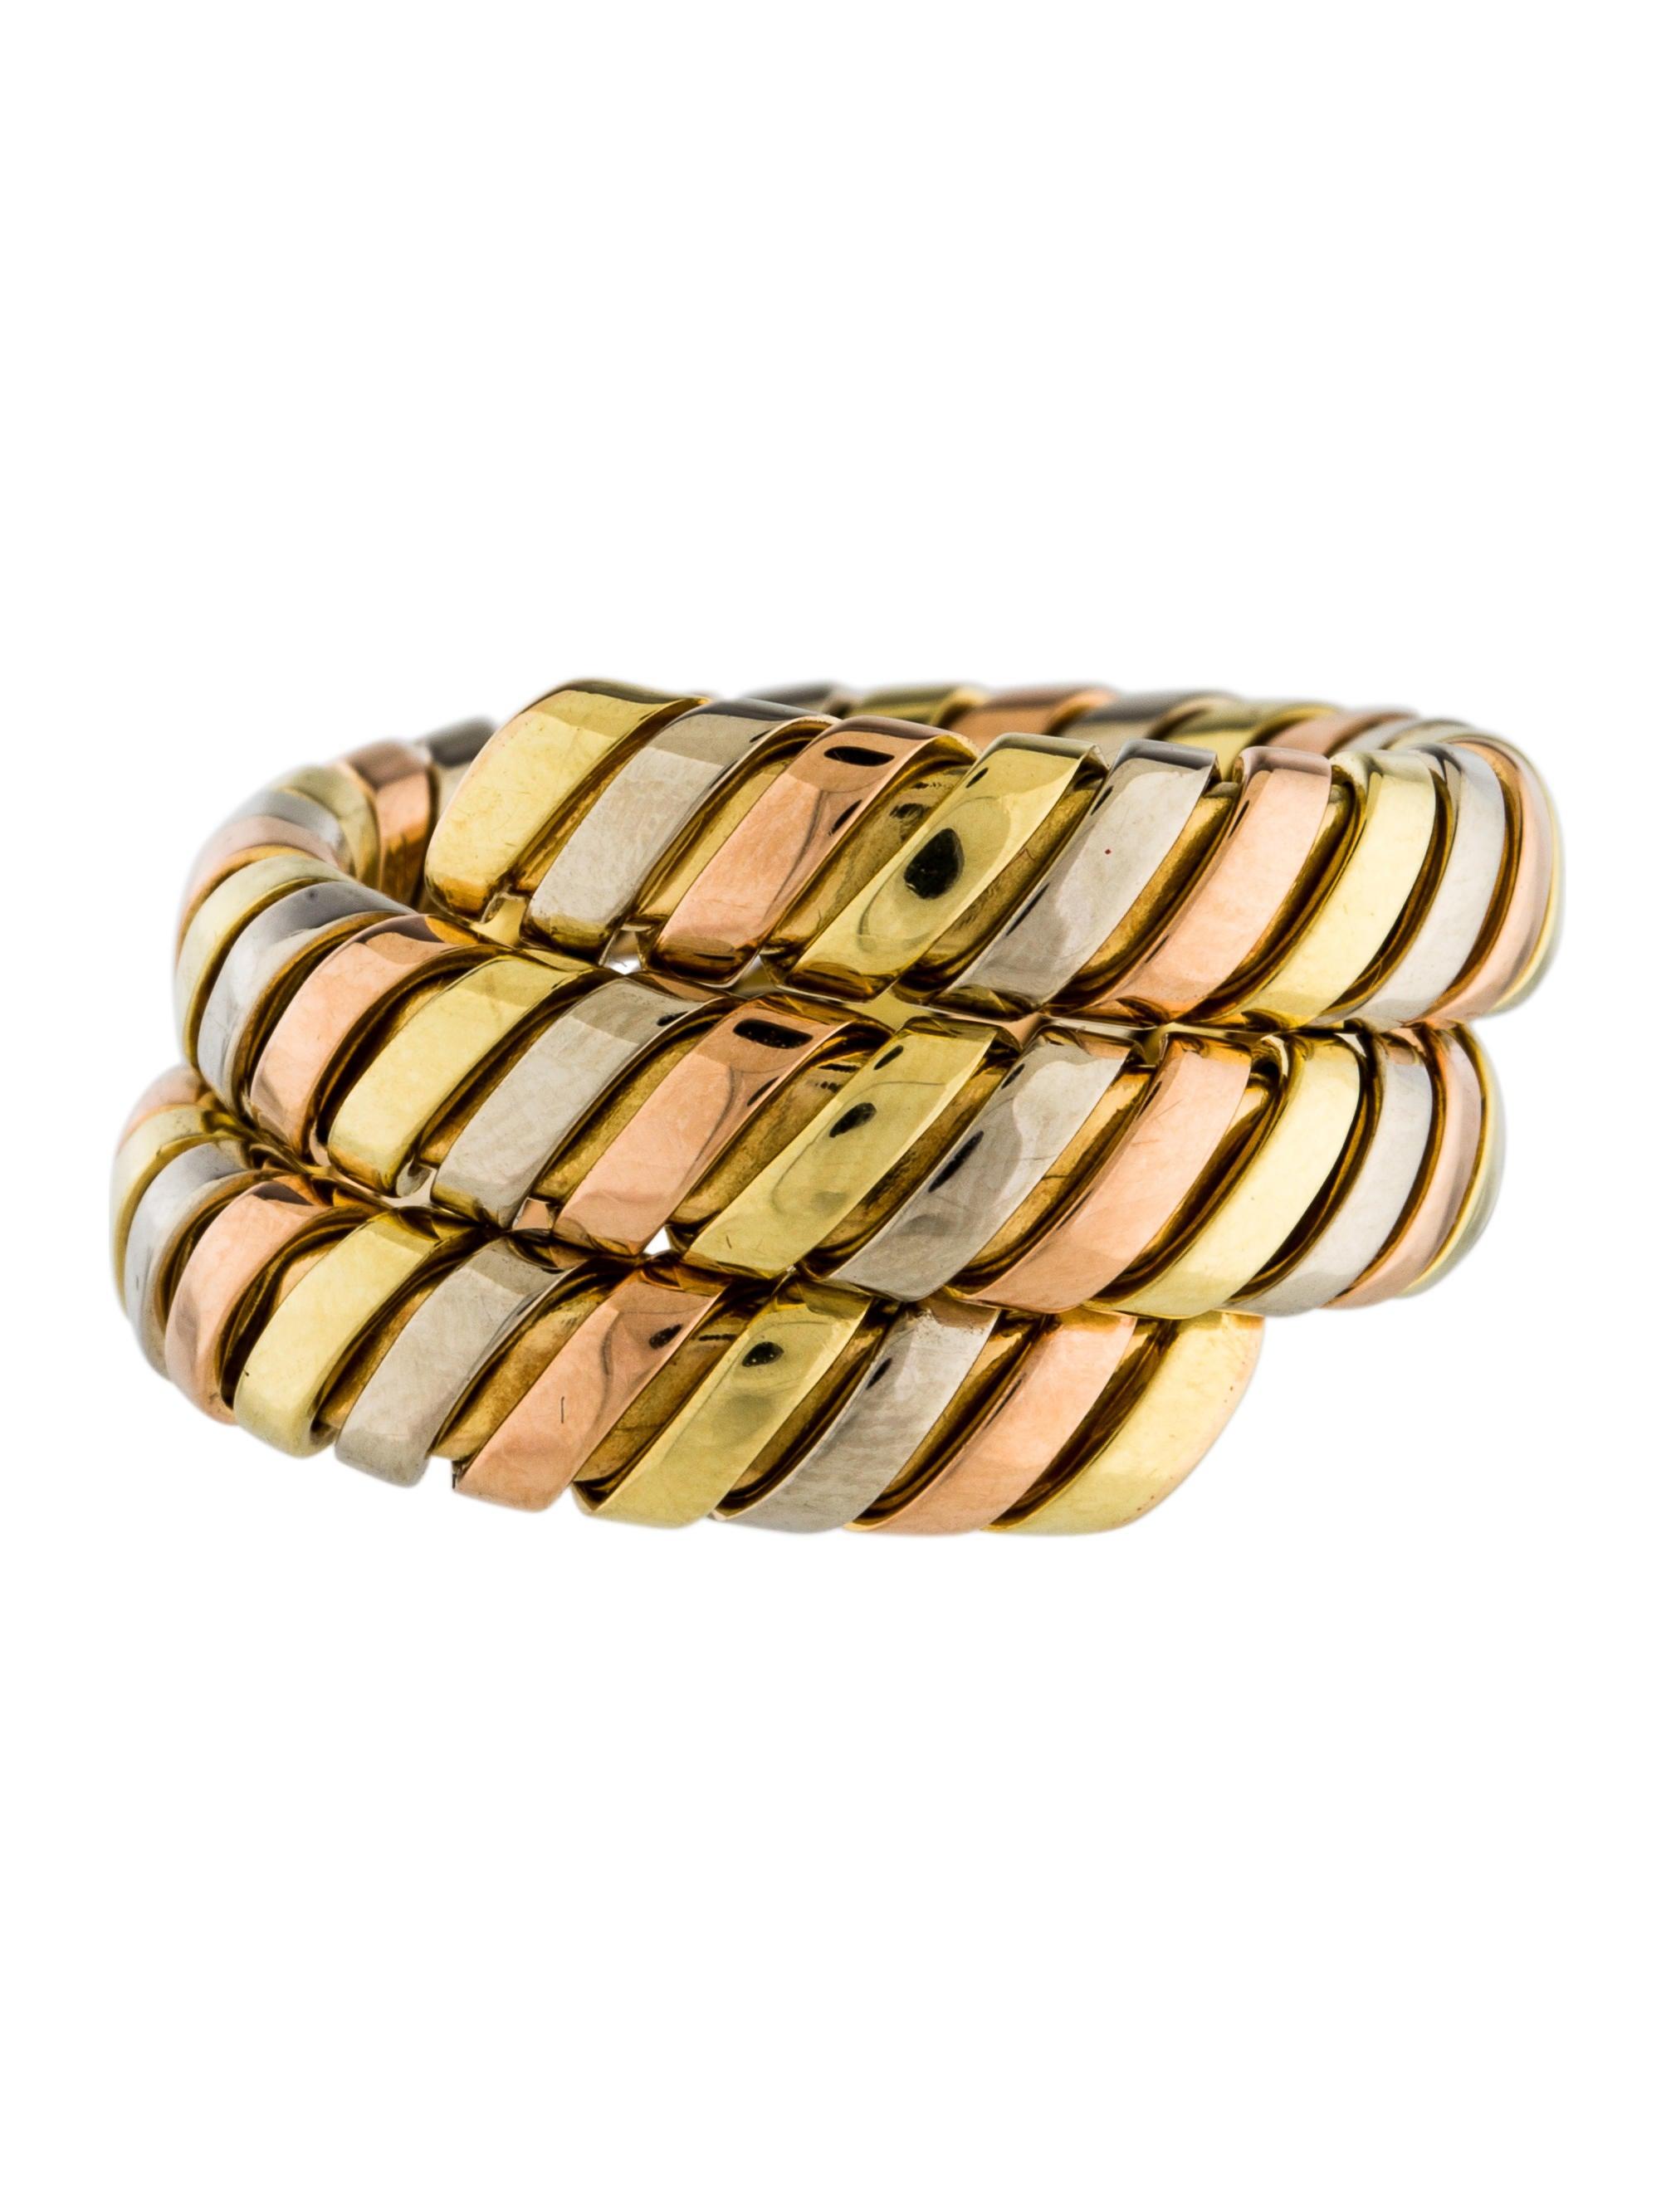 Bvlgari Serpenti Tubogas Coil Ring Rings Bul26461